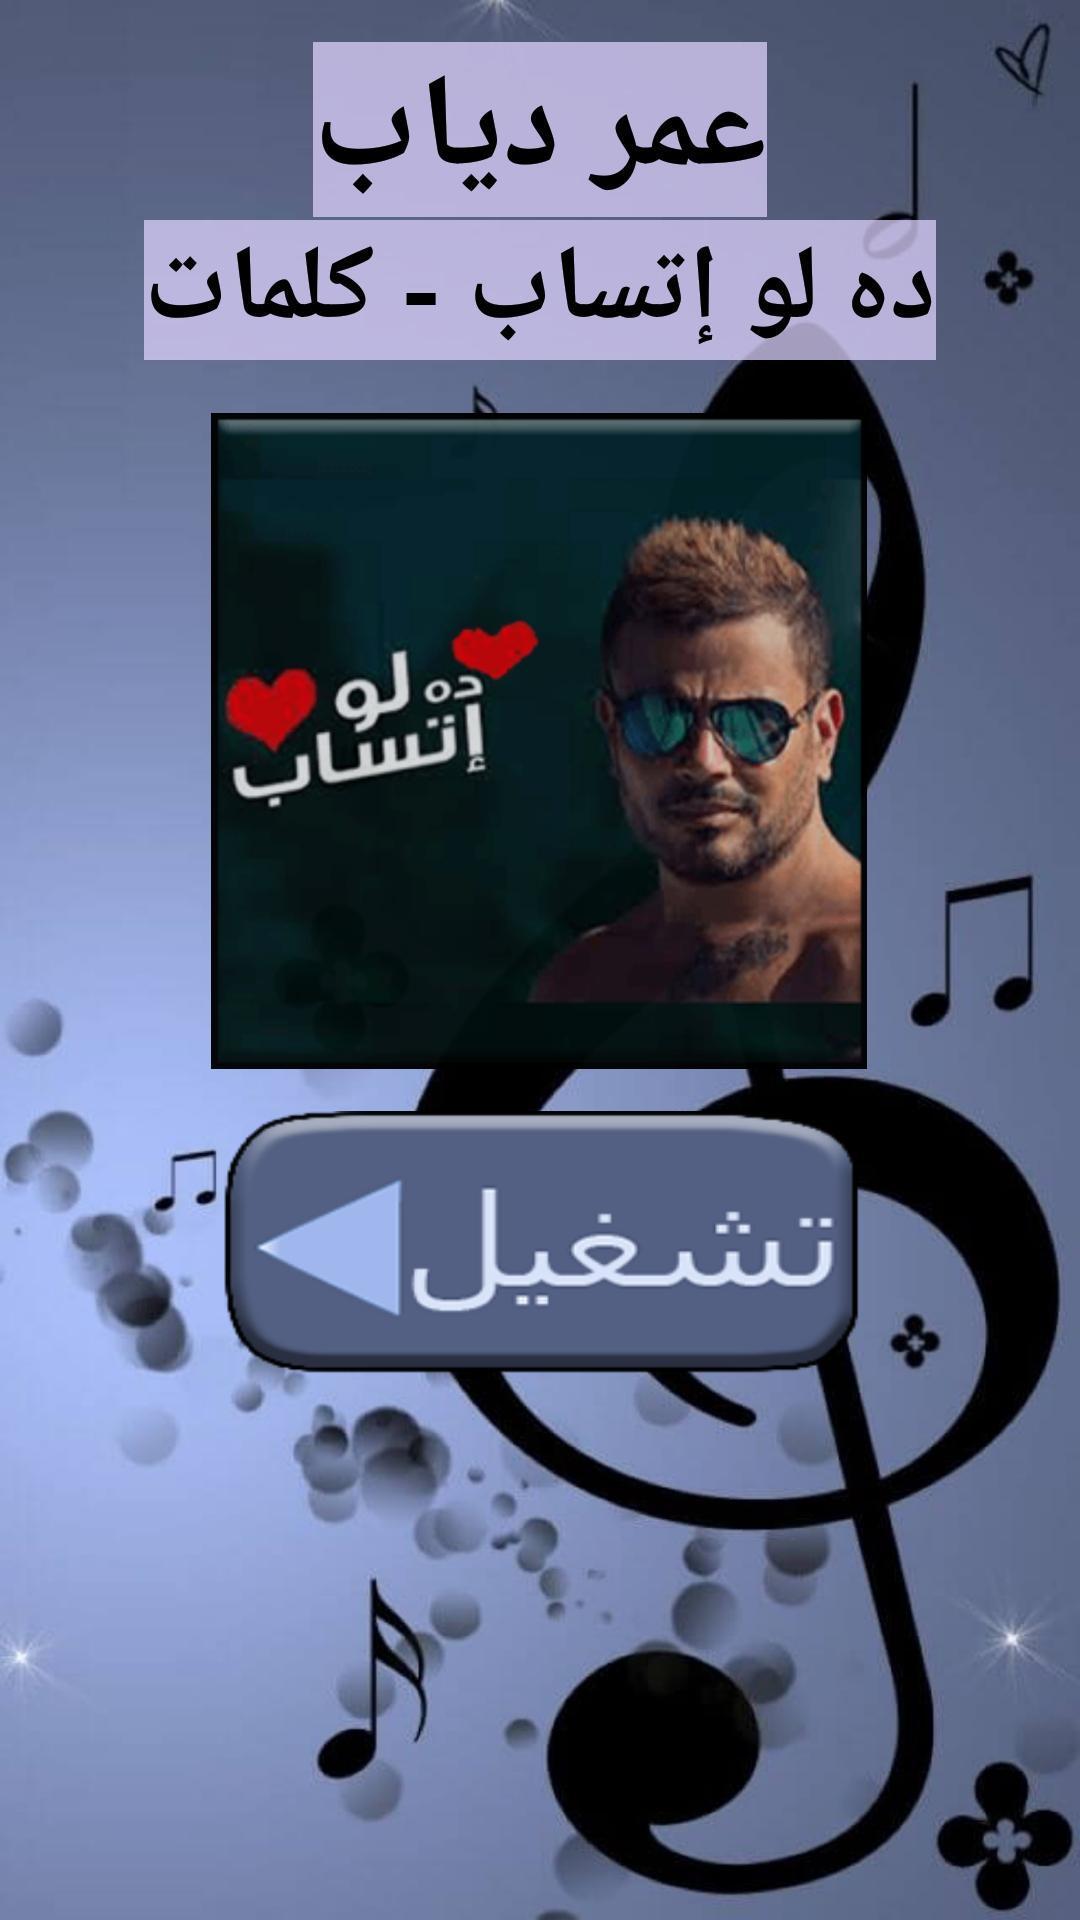 عمرو دياب بدون نت ده لو اتساب مع كلمات For Android Apk